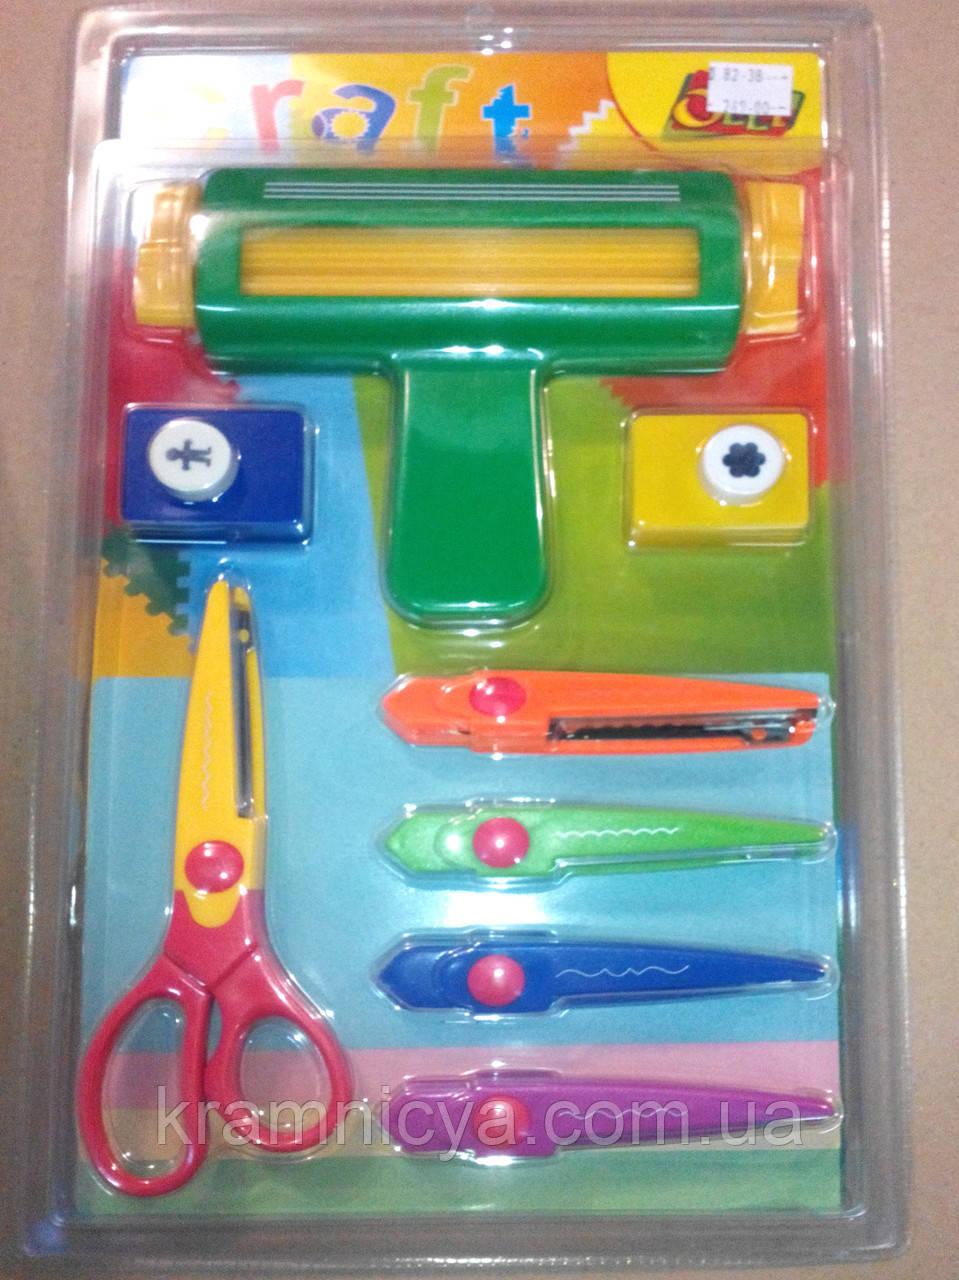 Набор для творчества 8 предметов, Olli Craft, OL-08A (910323)